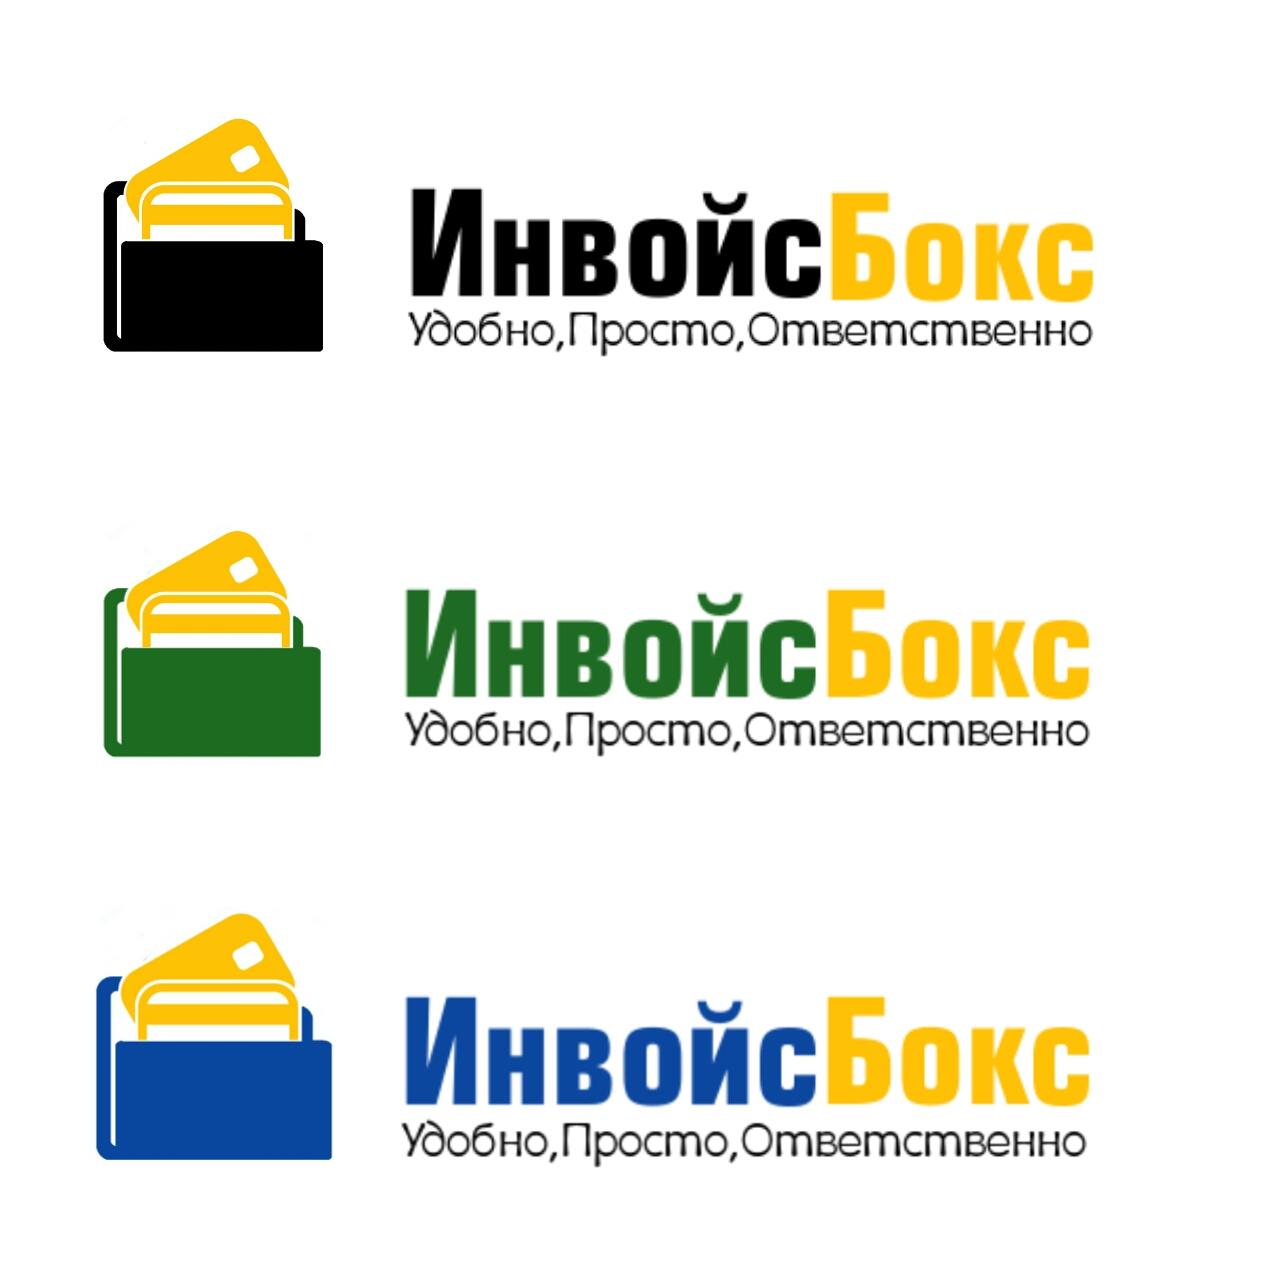 Разработка фирменного стиля компании фото f_2195bfbf32db8ba4.jpg